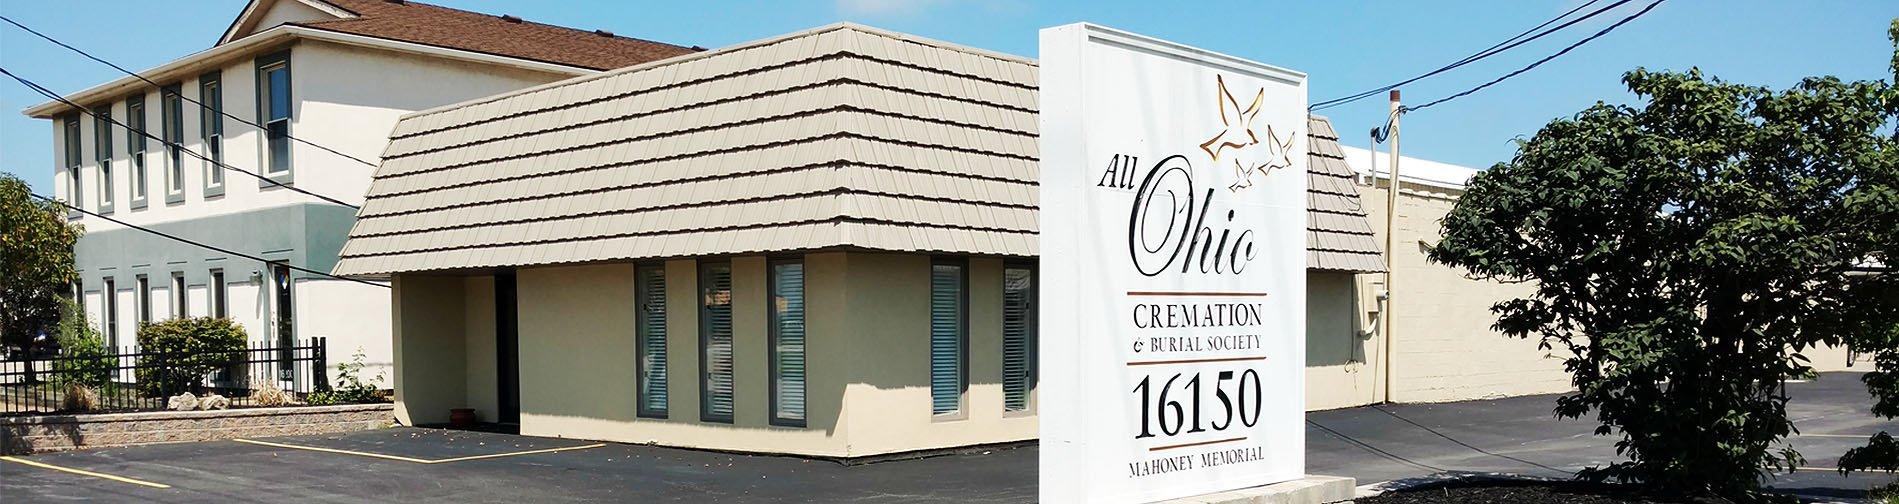 Michael P. Hite, Sr. — All Ohio Cremation & Burial Society